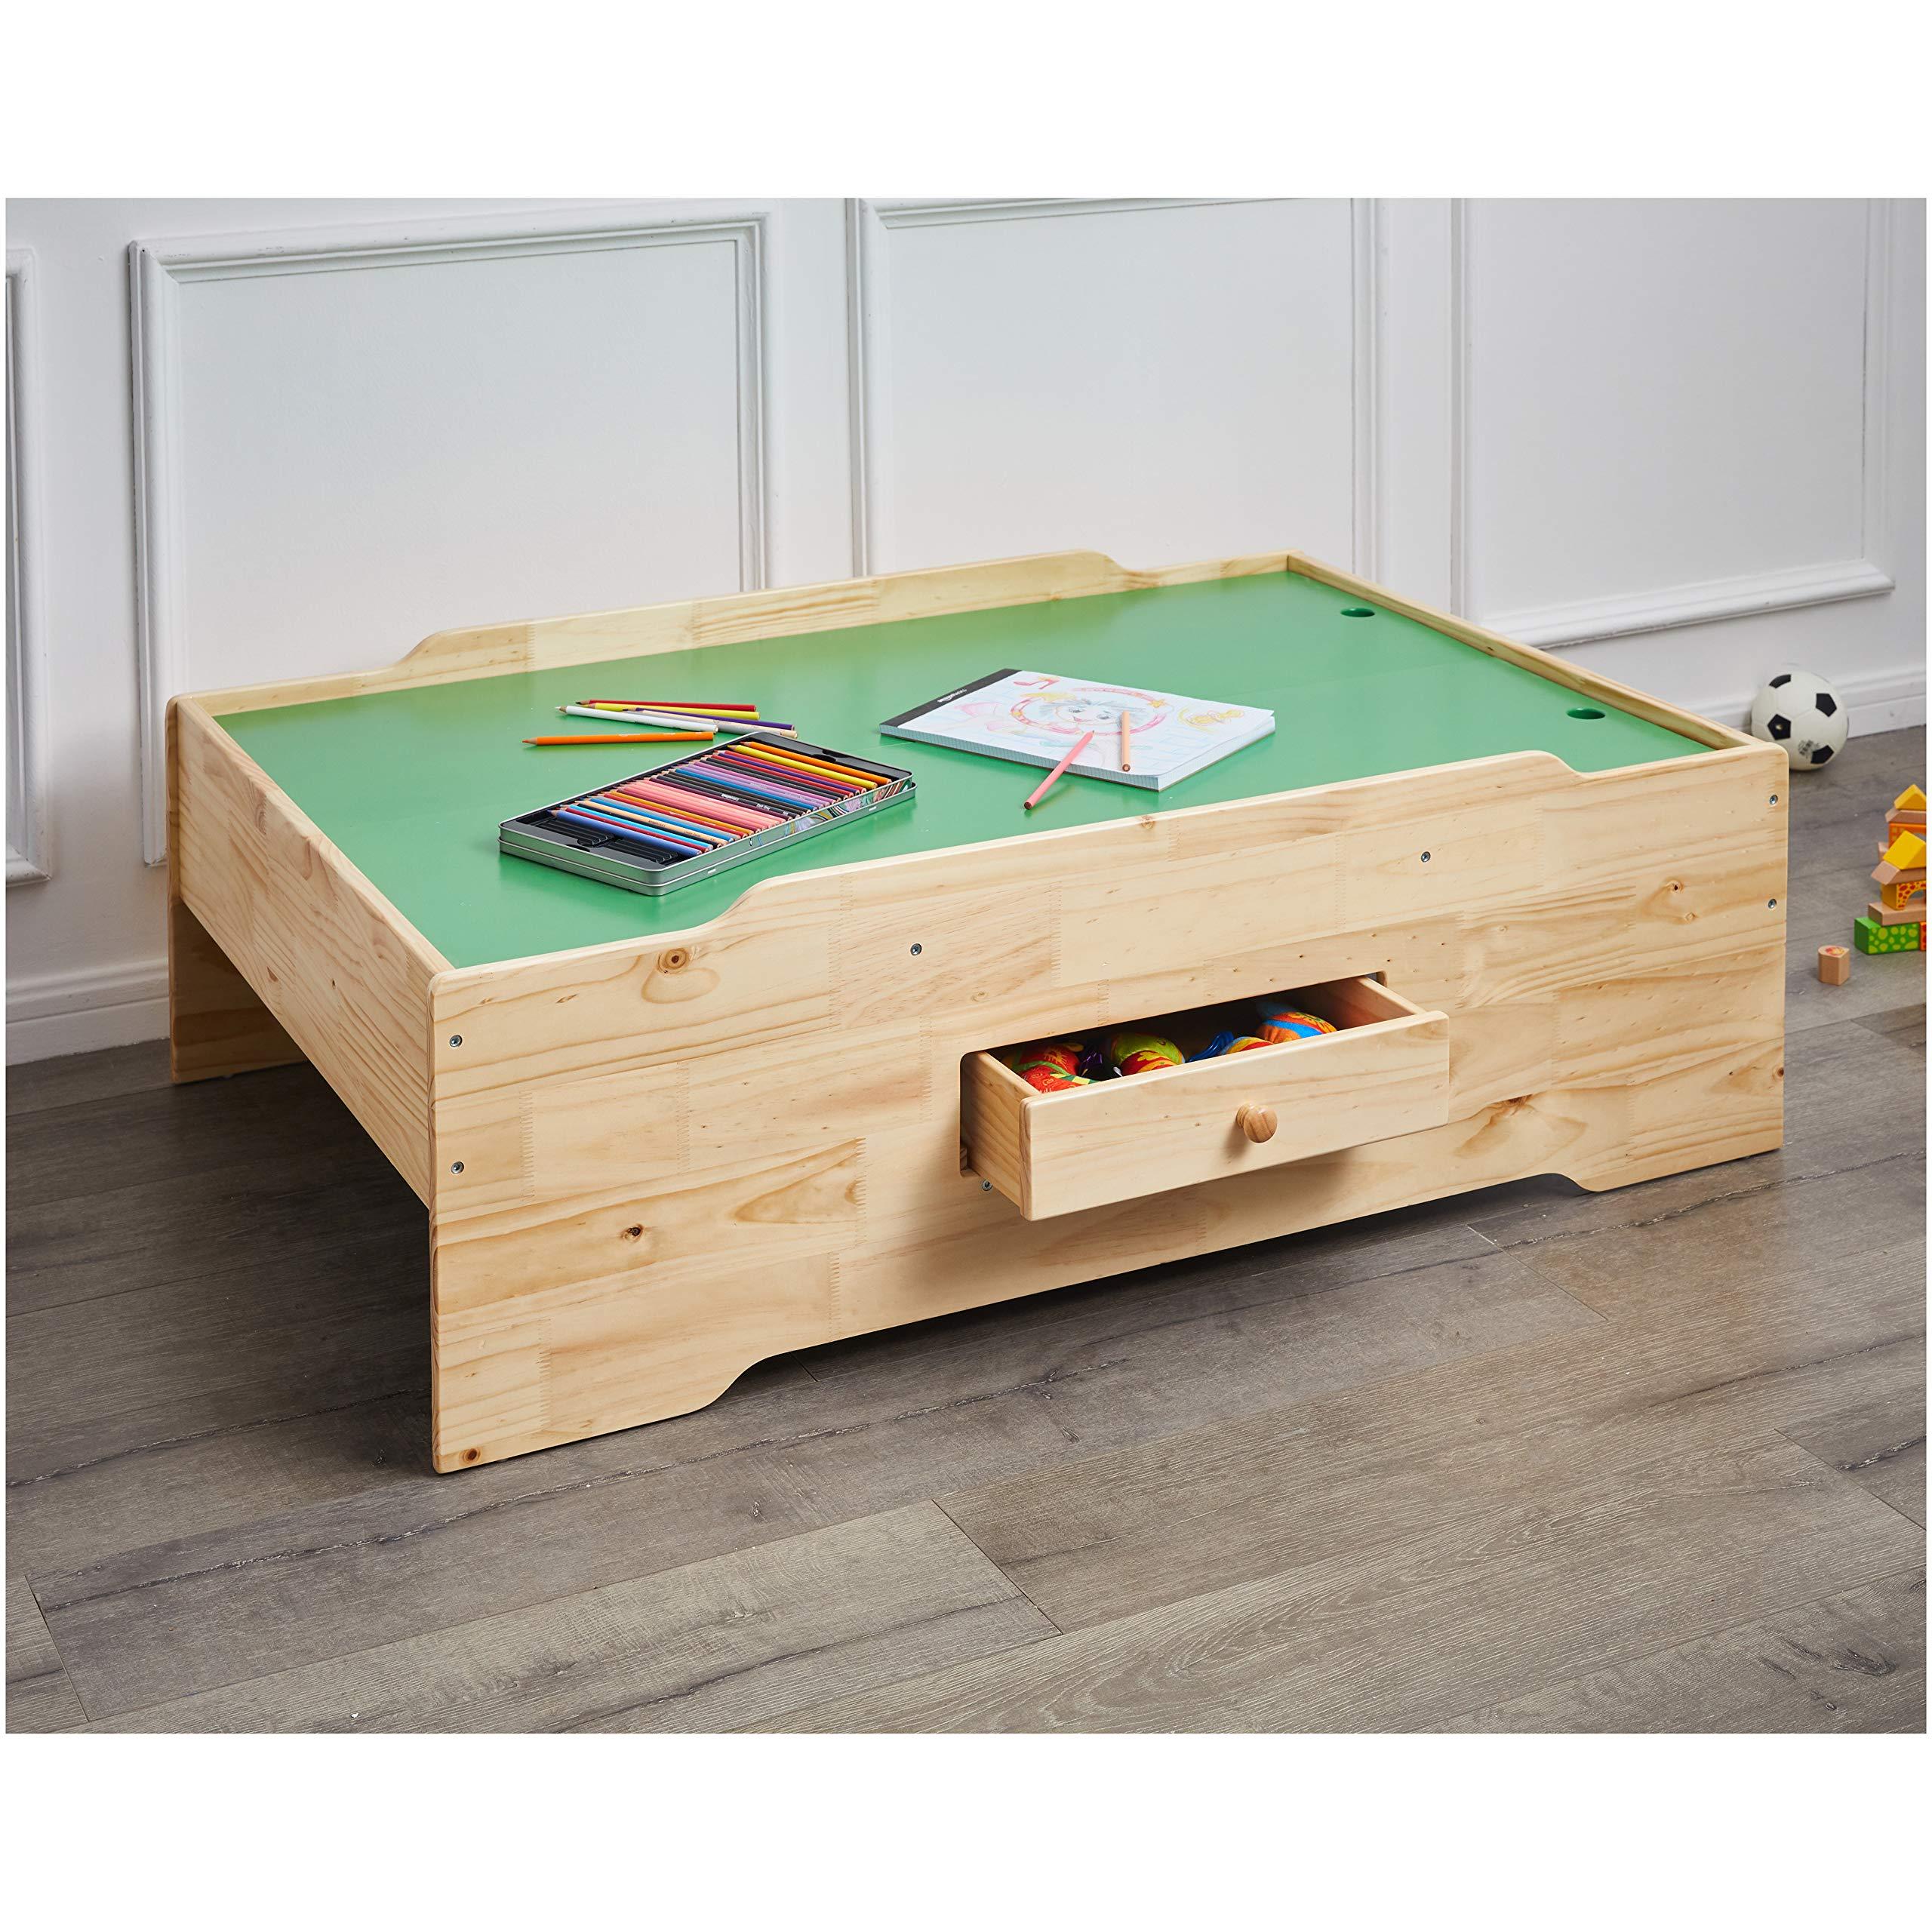 AmazonBasics Wooden Multi-Activity Play Table, Natural by AmazonBasics (Image #2)